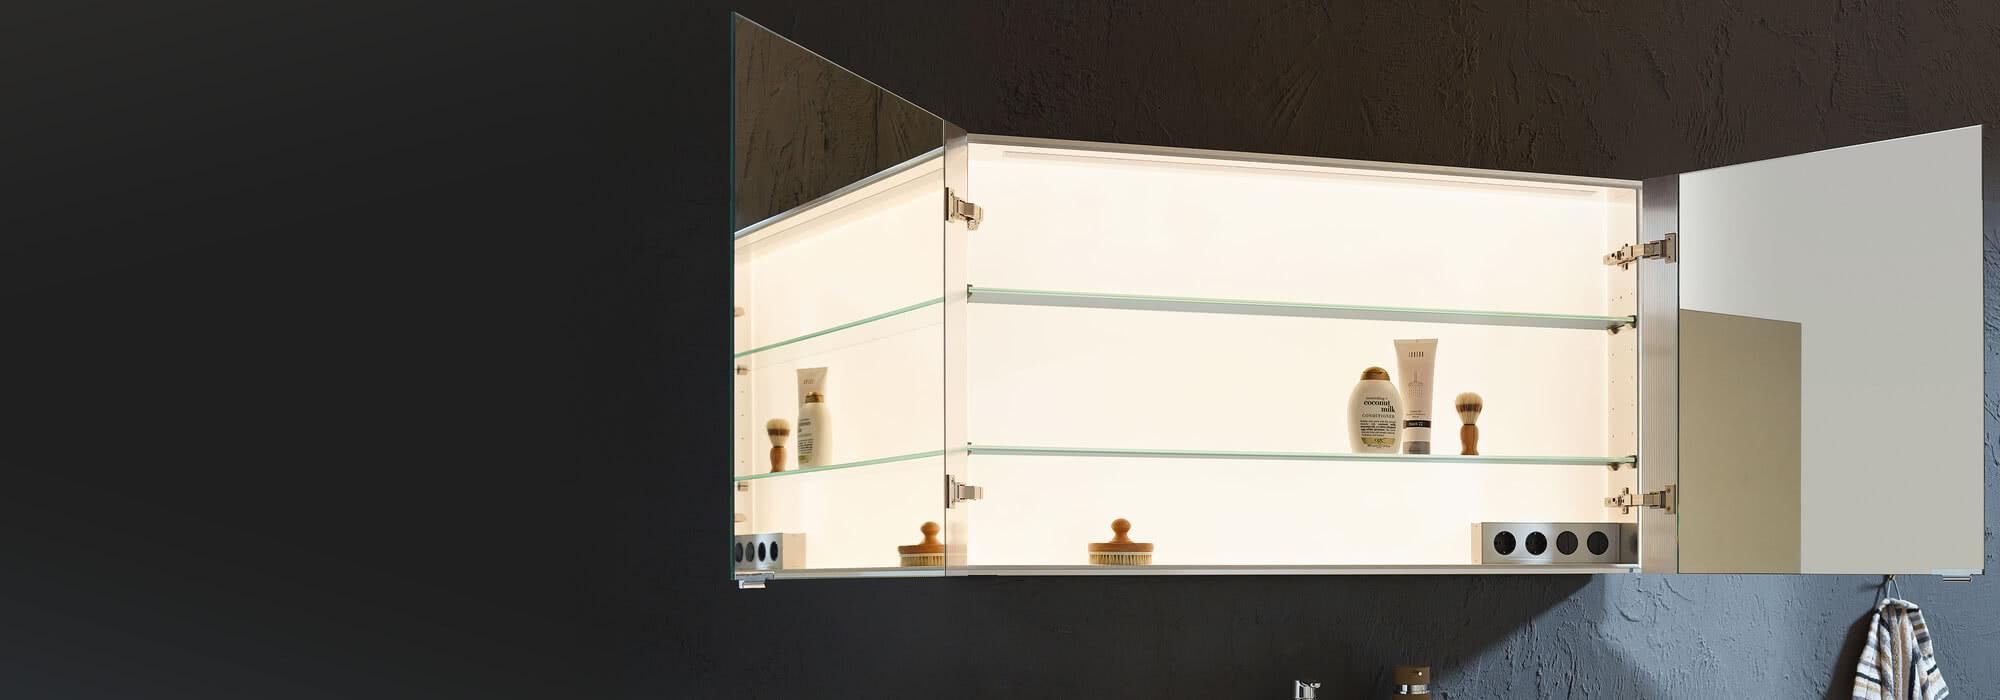 2018 SPRINZ Kopfbanner Schrankbeleuchtung 5000x1900.jpg